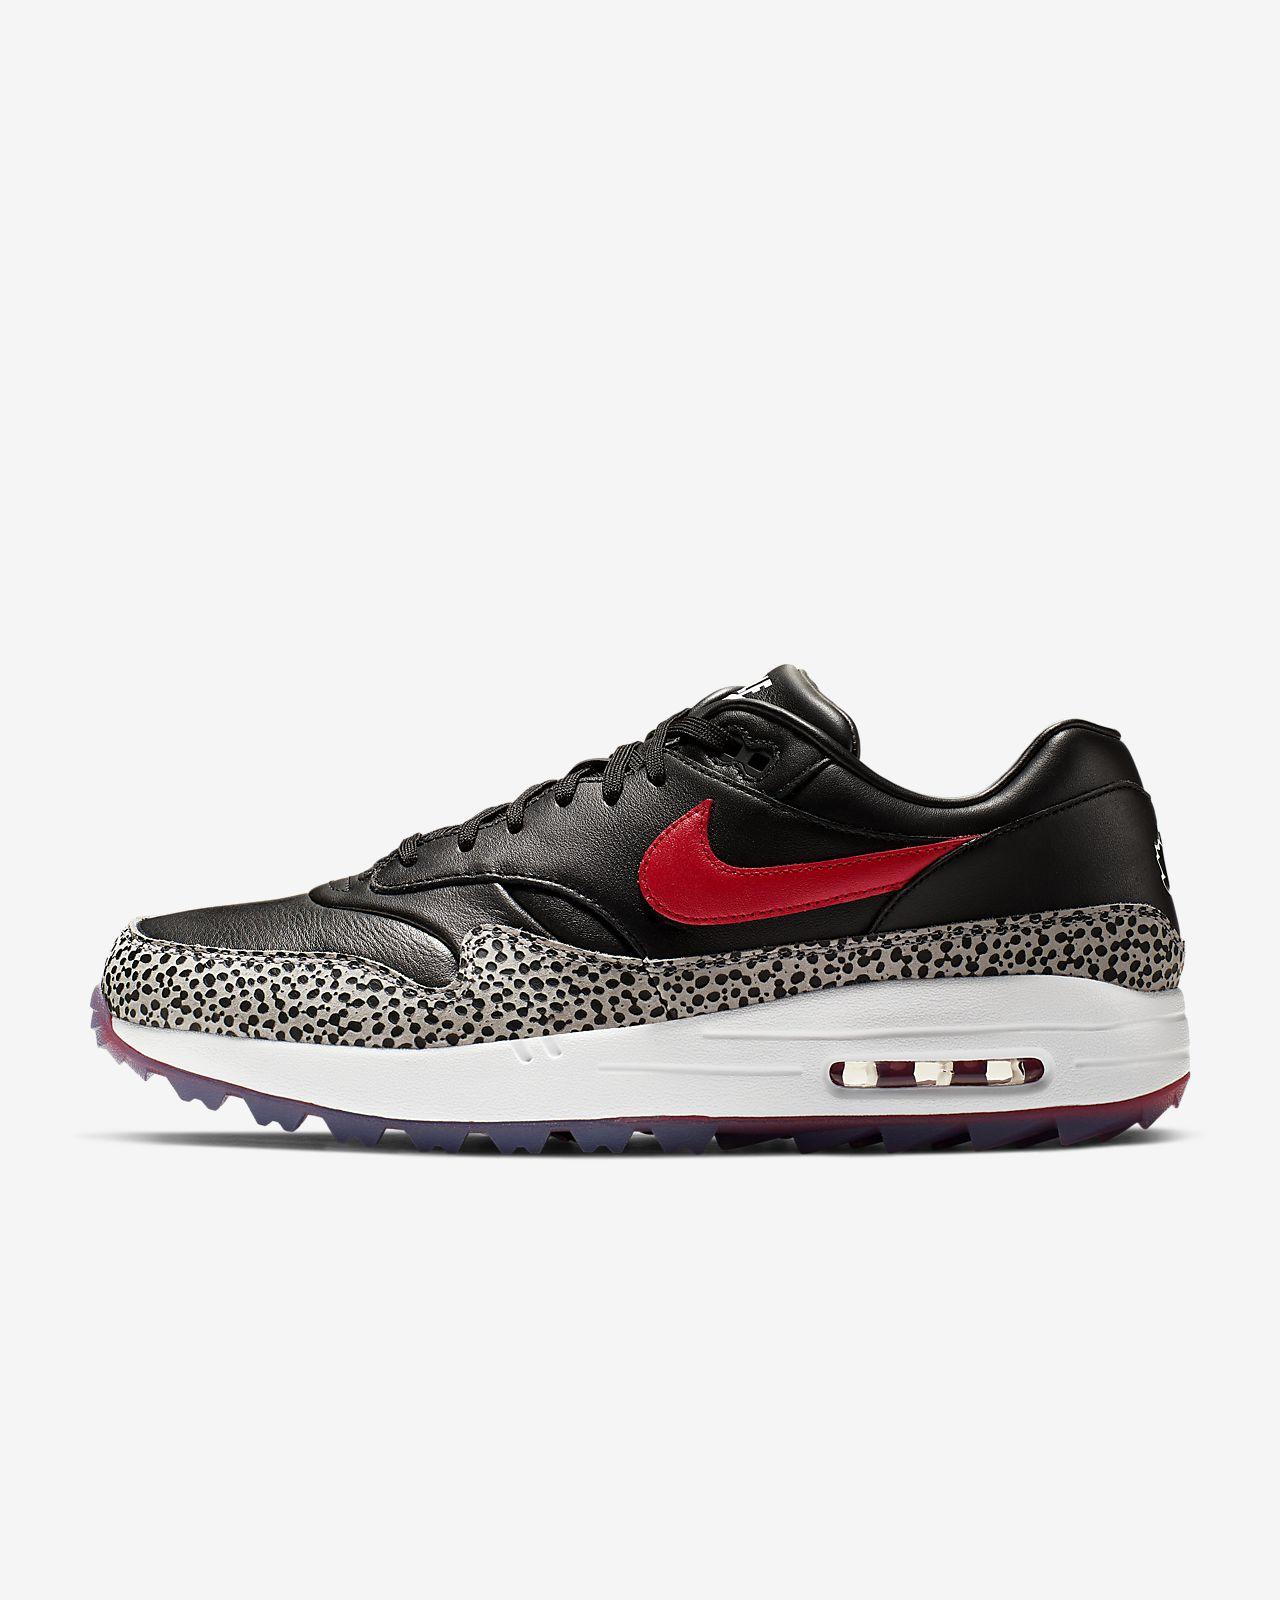 82833add13 Nike Air Max 1G NRG Men's Golf Shoe. Nike.com DK